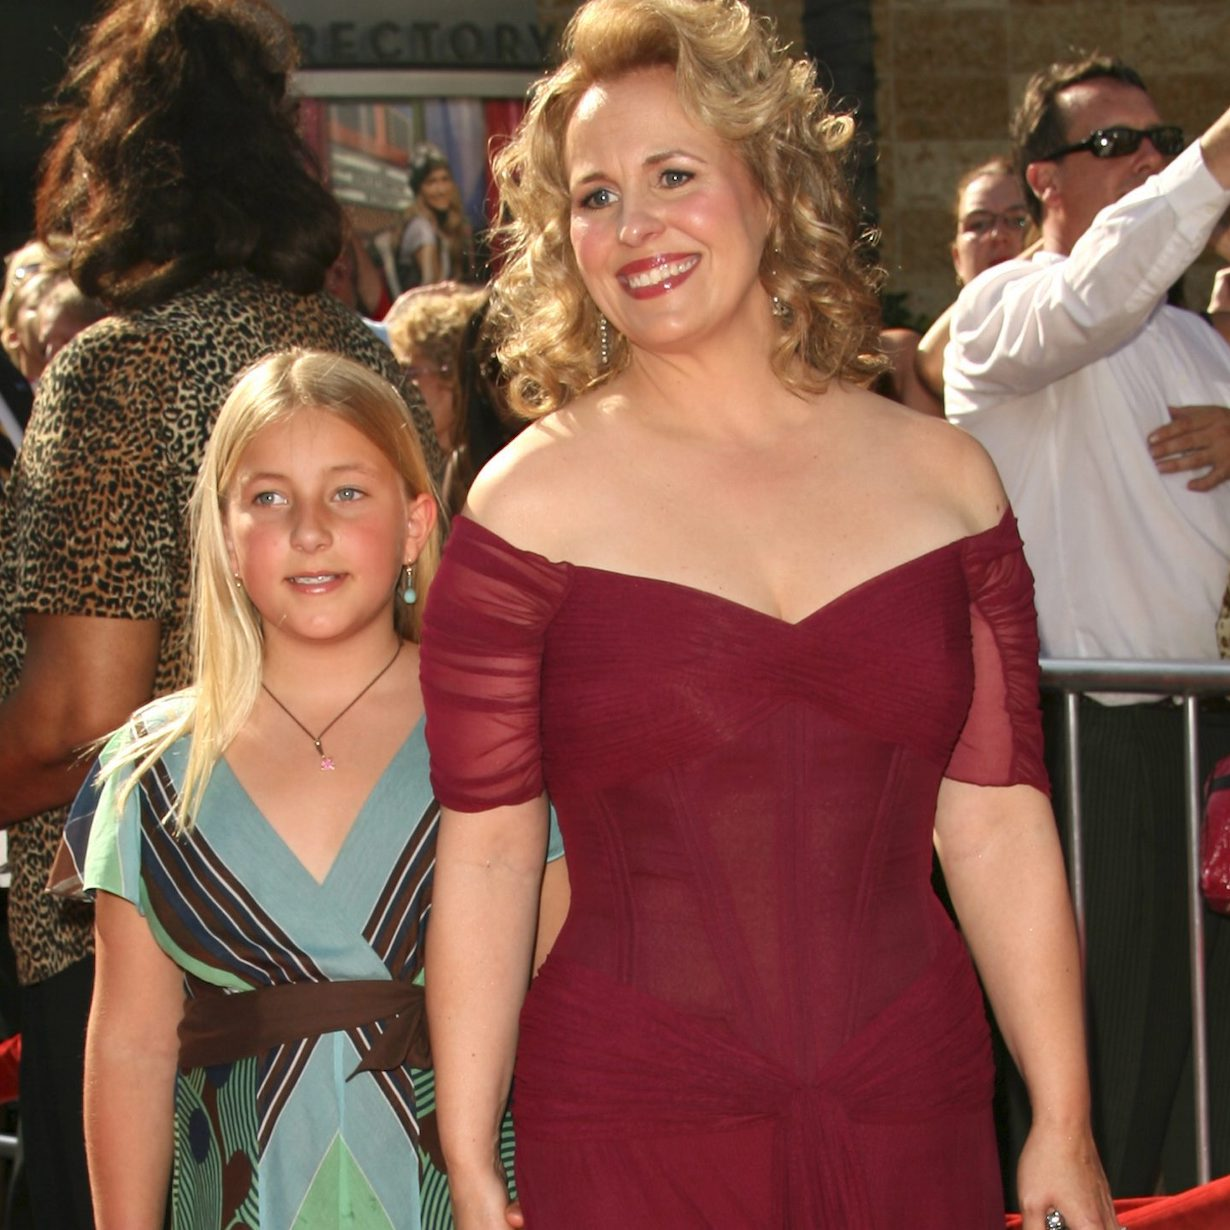 Genie Francis34th Annual Daytime Emmys Awards - ArrivalsKodak TheaterHollywood6/15/07©Jill Johnson/jpistudios.com310-657-9661